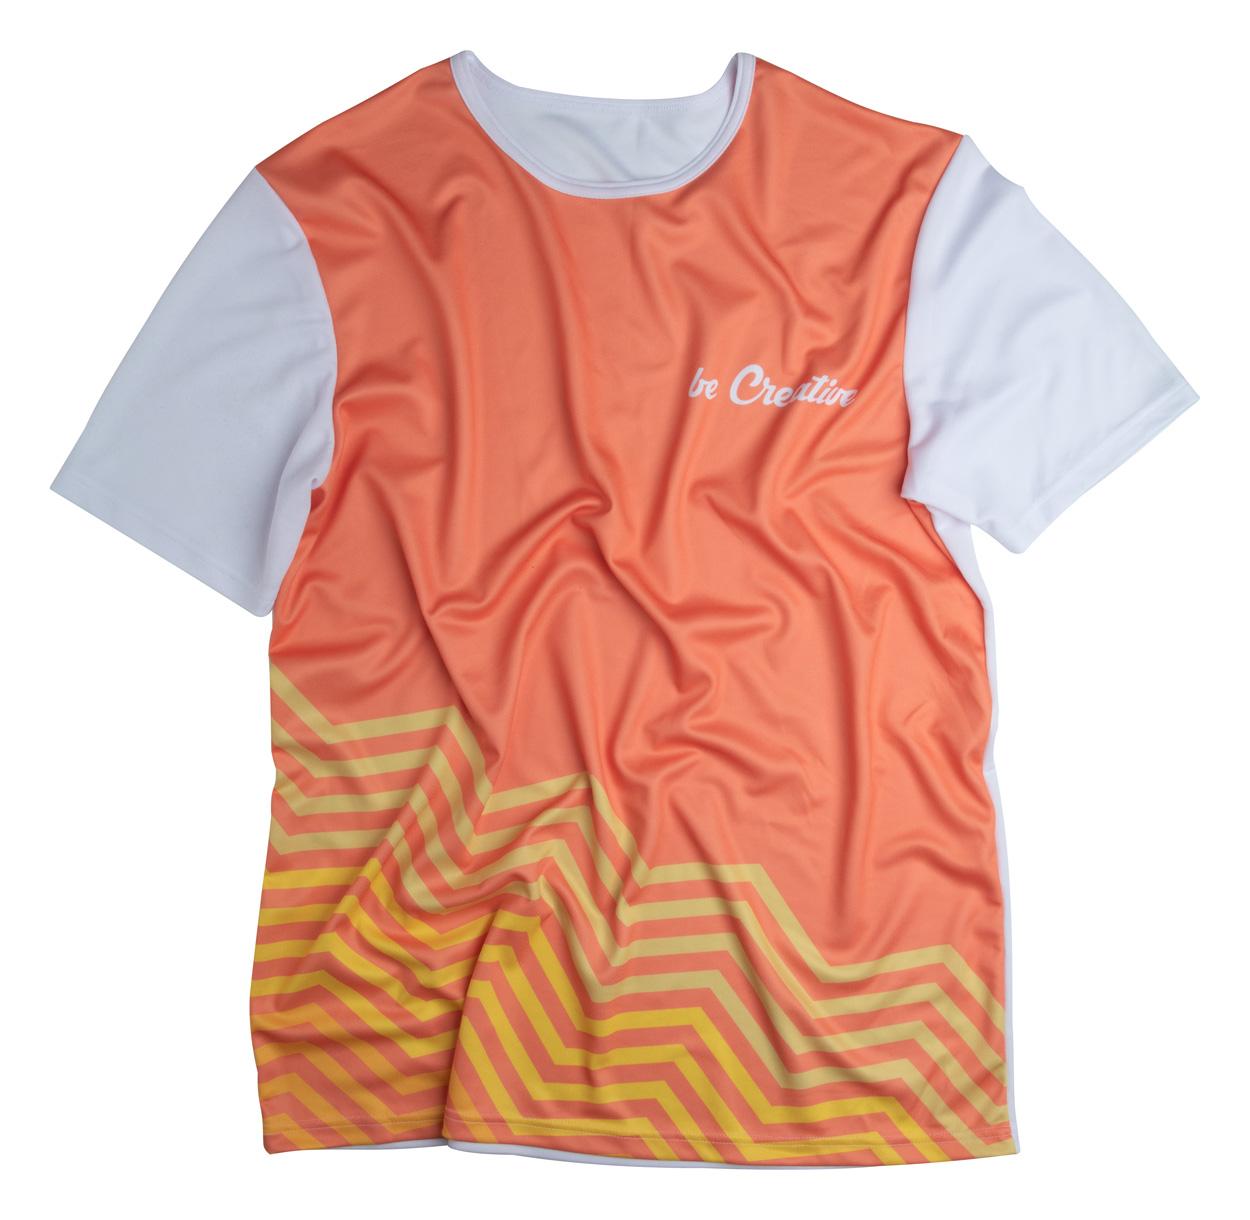 CreaSport Zero custom sport T-shirt